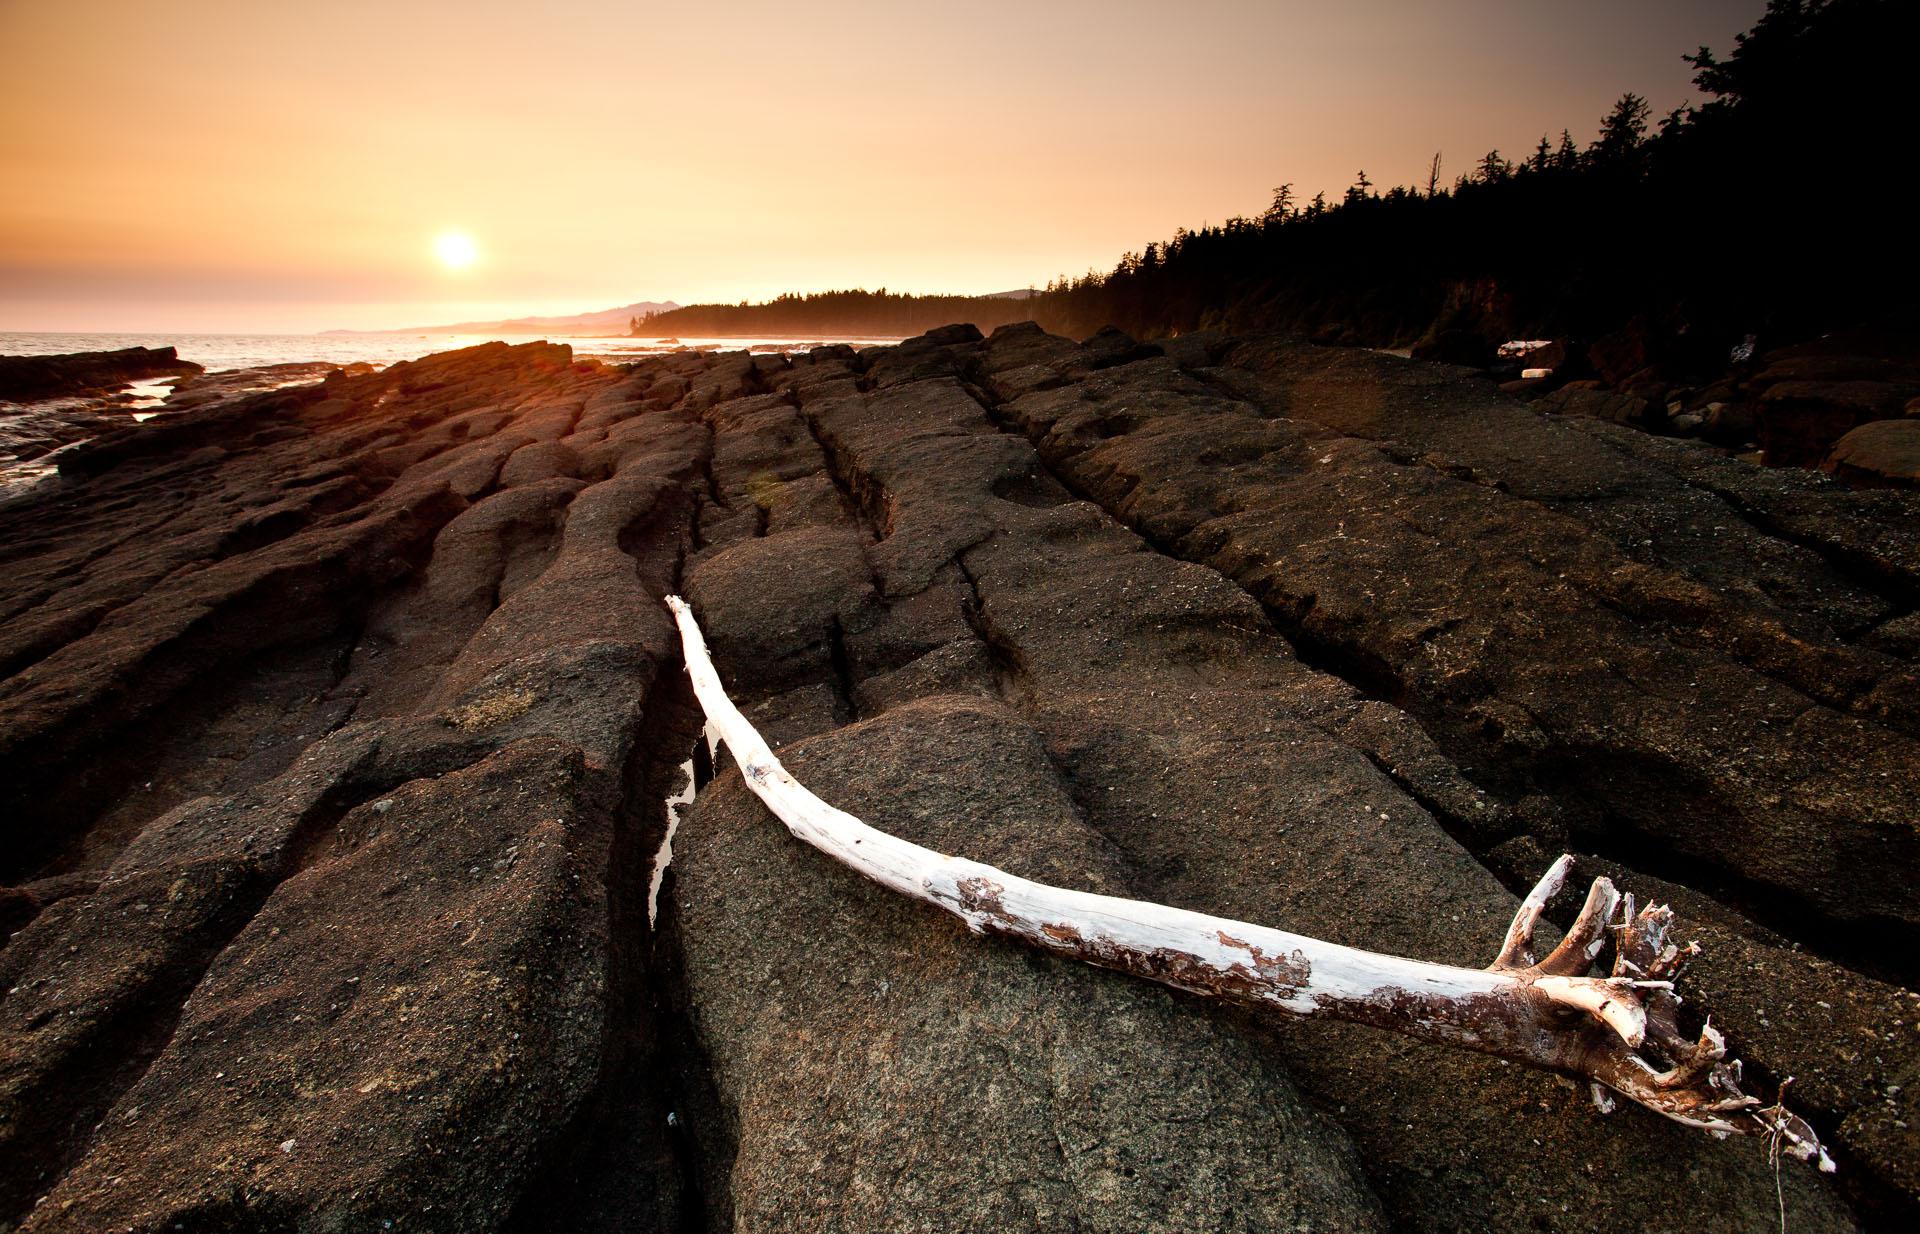 west-coast-trail-driftwood-sunset.jpg